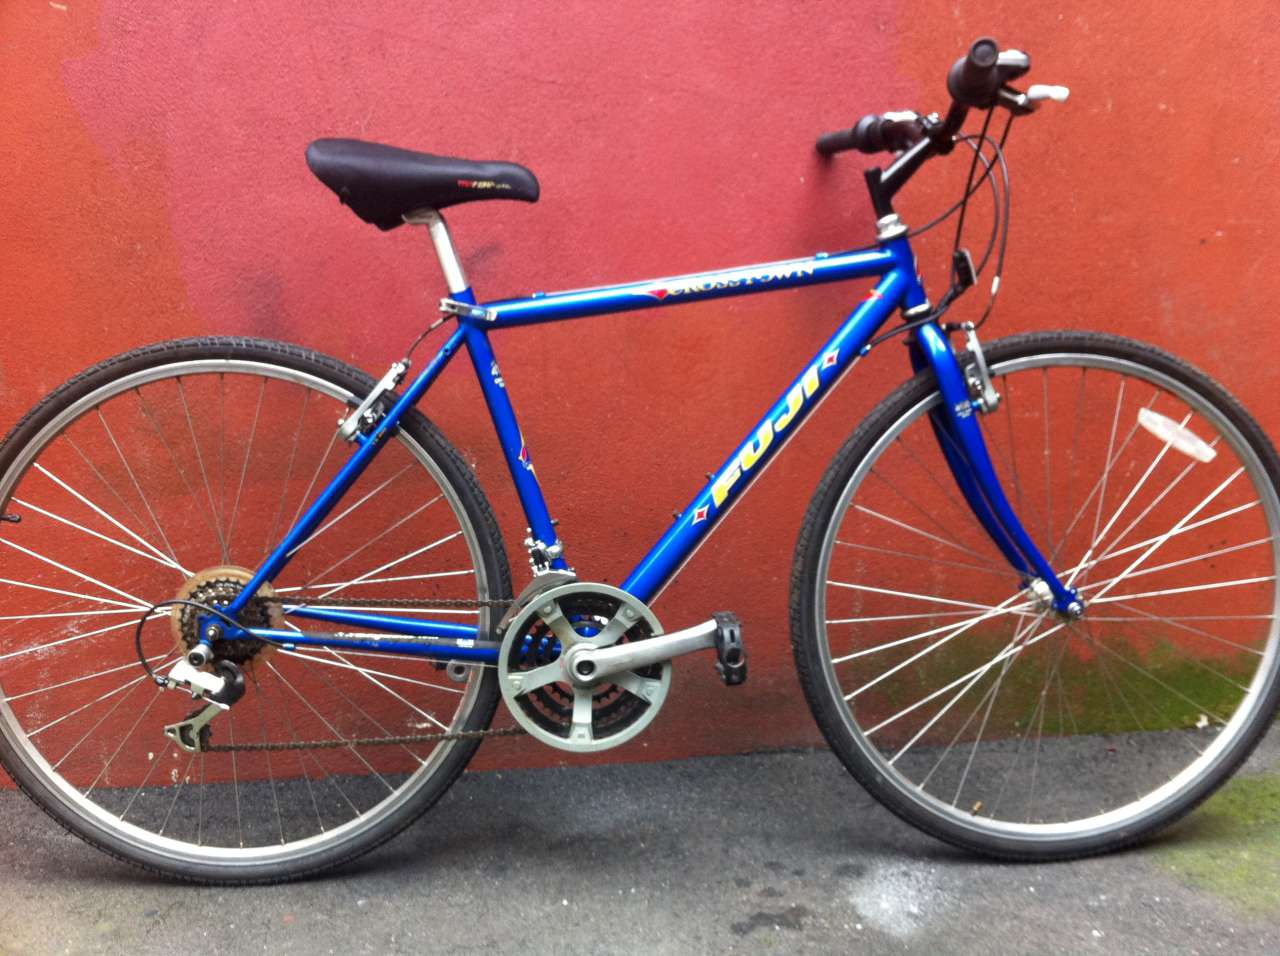 Bike Boom Refurbished Bikes Fuji Crosstown